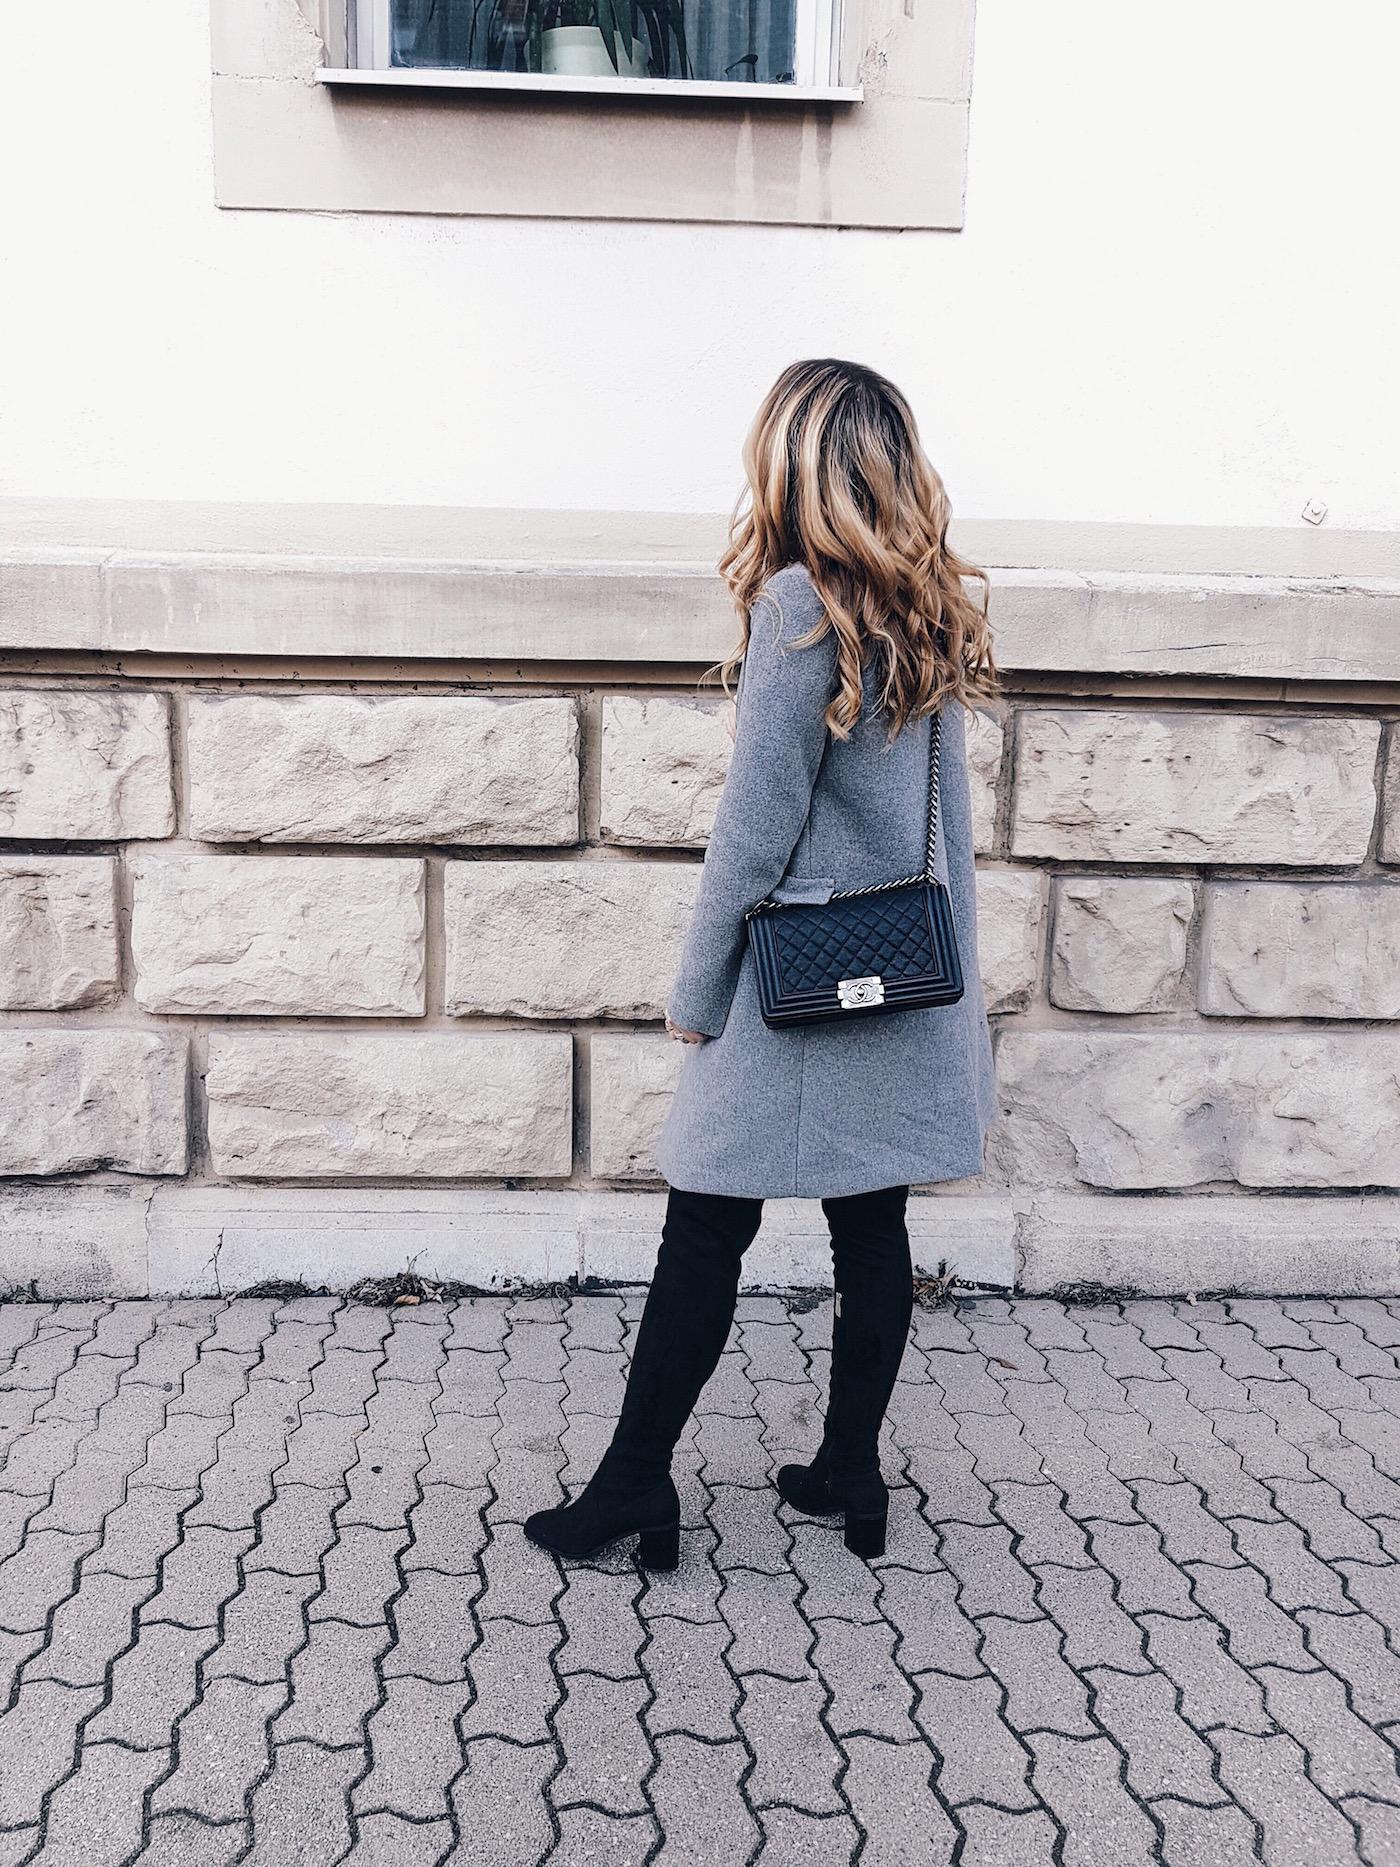 Instagram Algorithm Myths Want Get Repeat Blog Motivation Monday